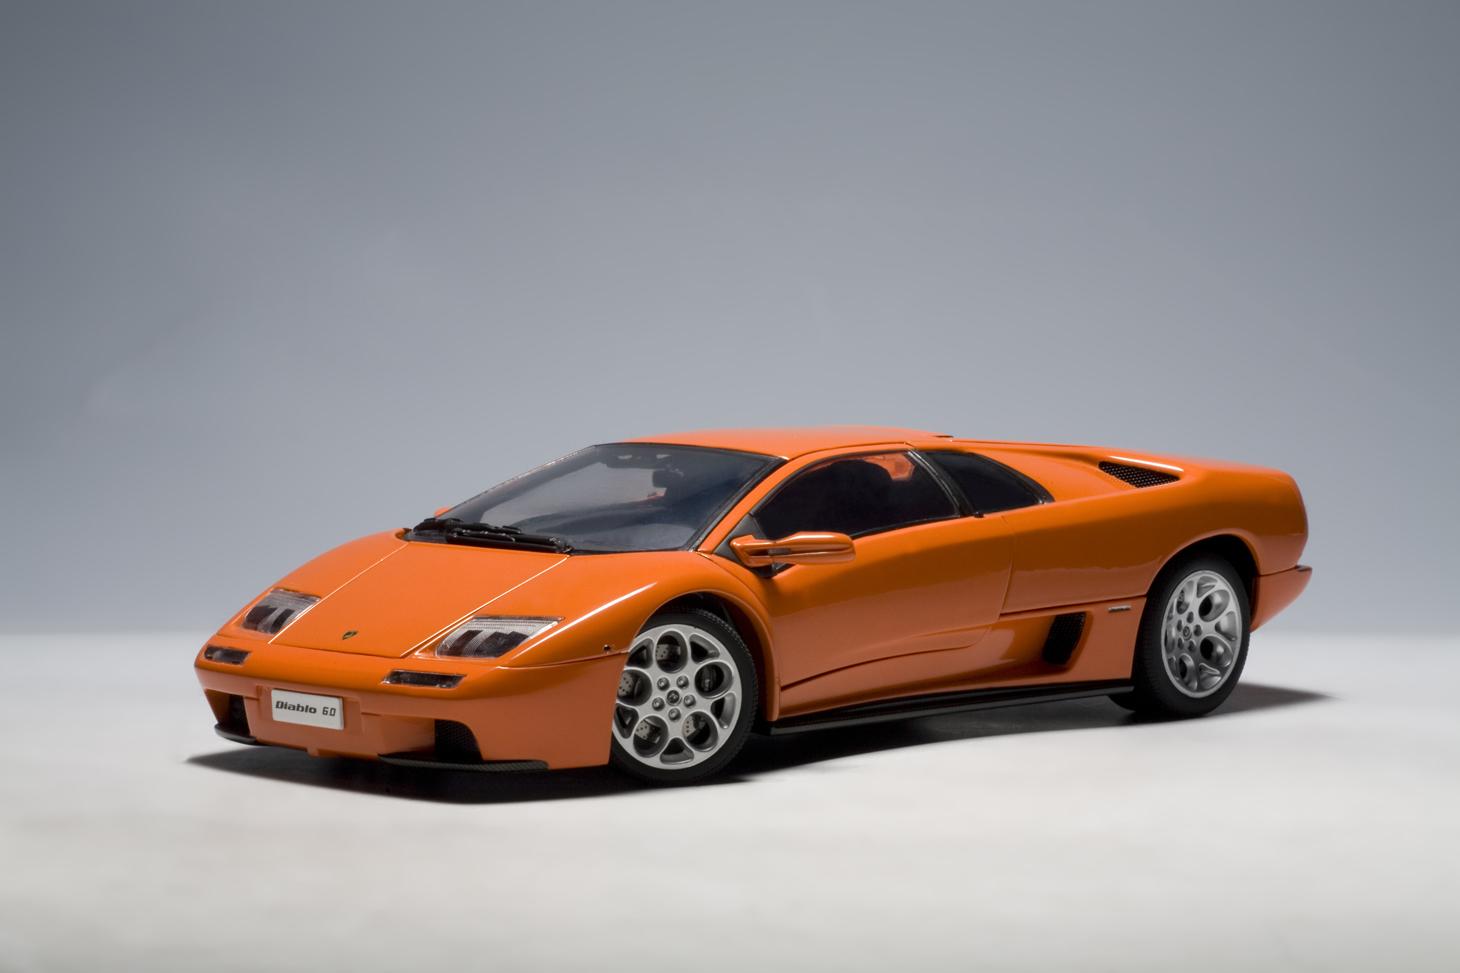 2000 Lamborghini Diablo Vt 6 0 Related Infomation